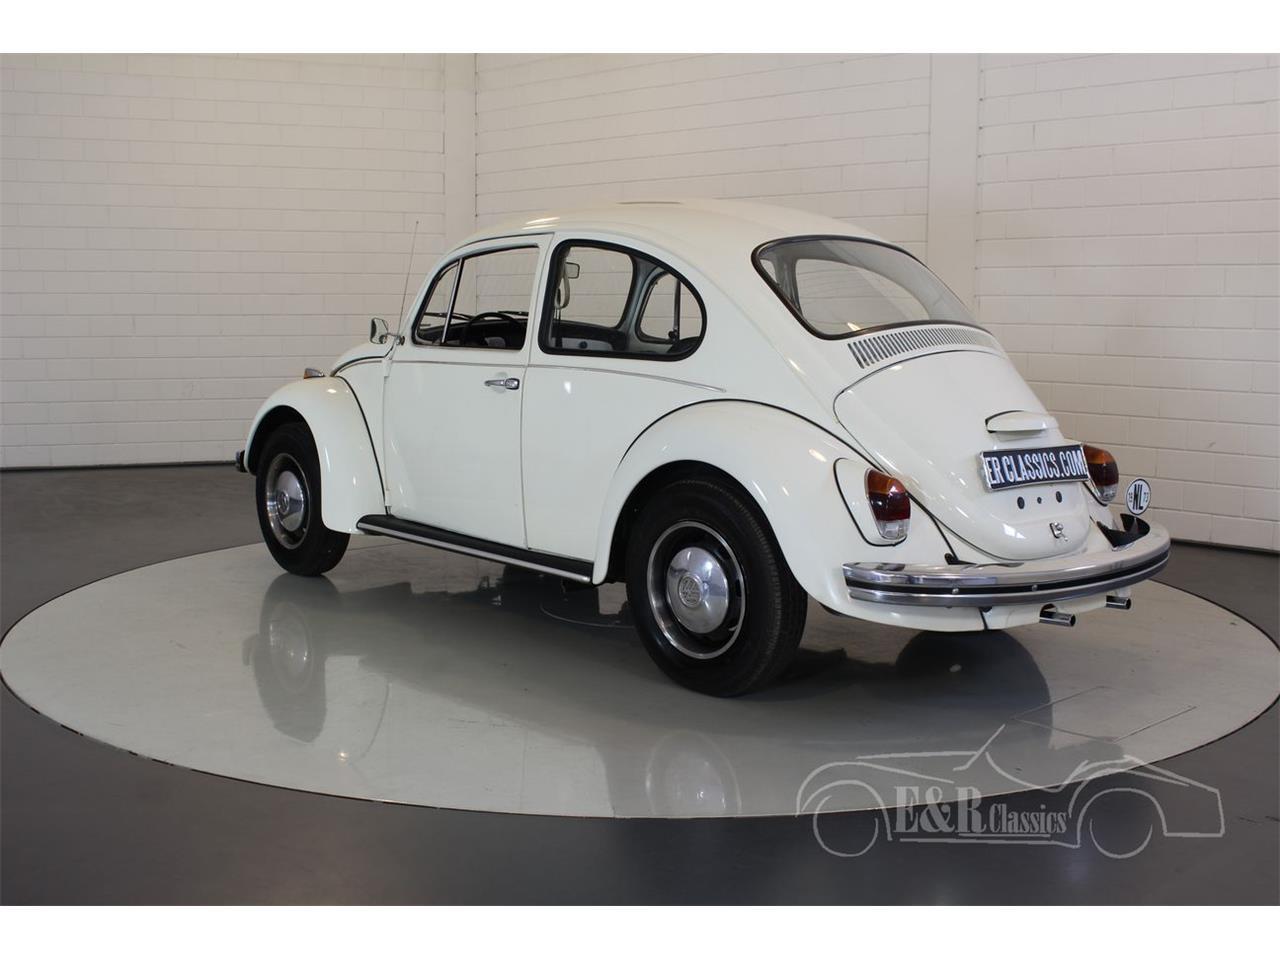 Large Picture of 1973 Volkswagen Beetle - $13,500.00 - QJ2U